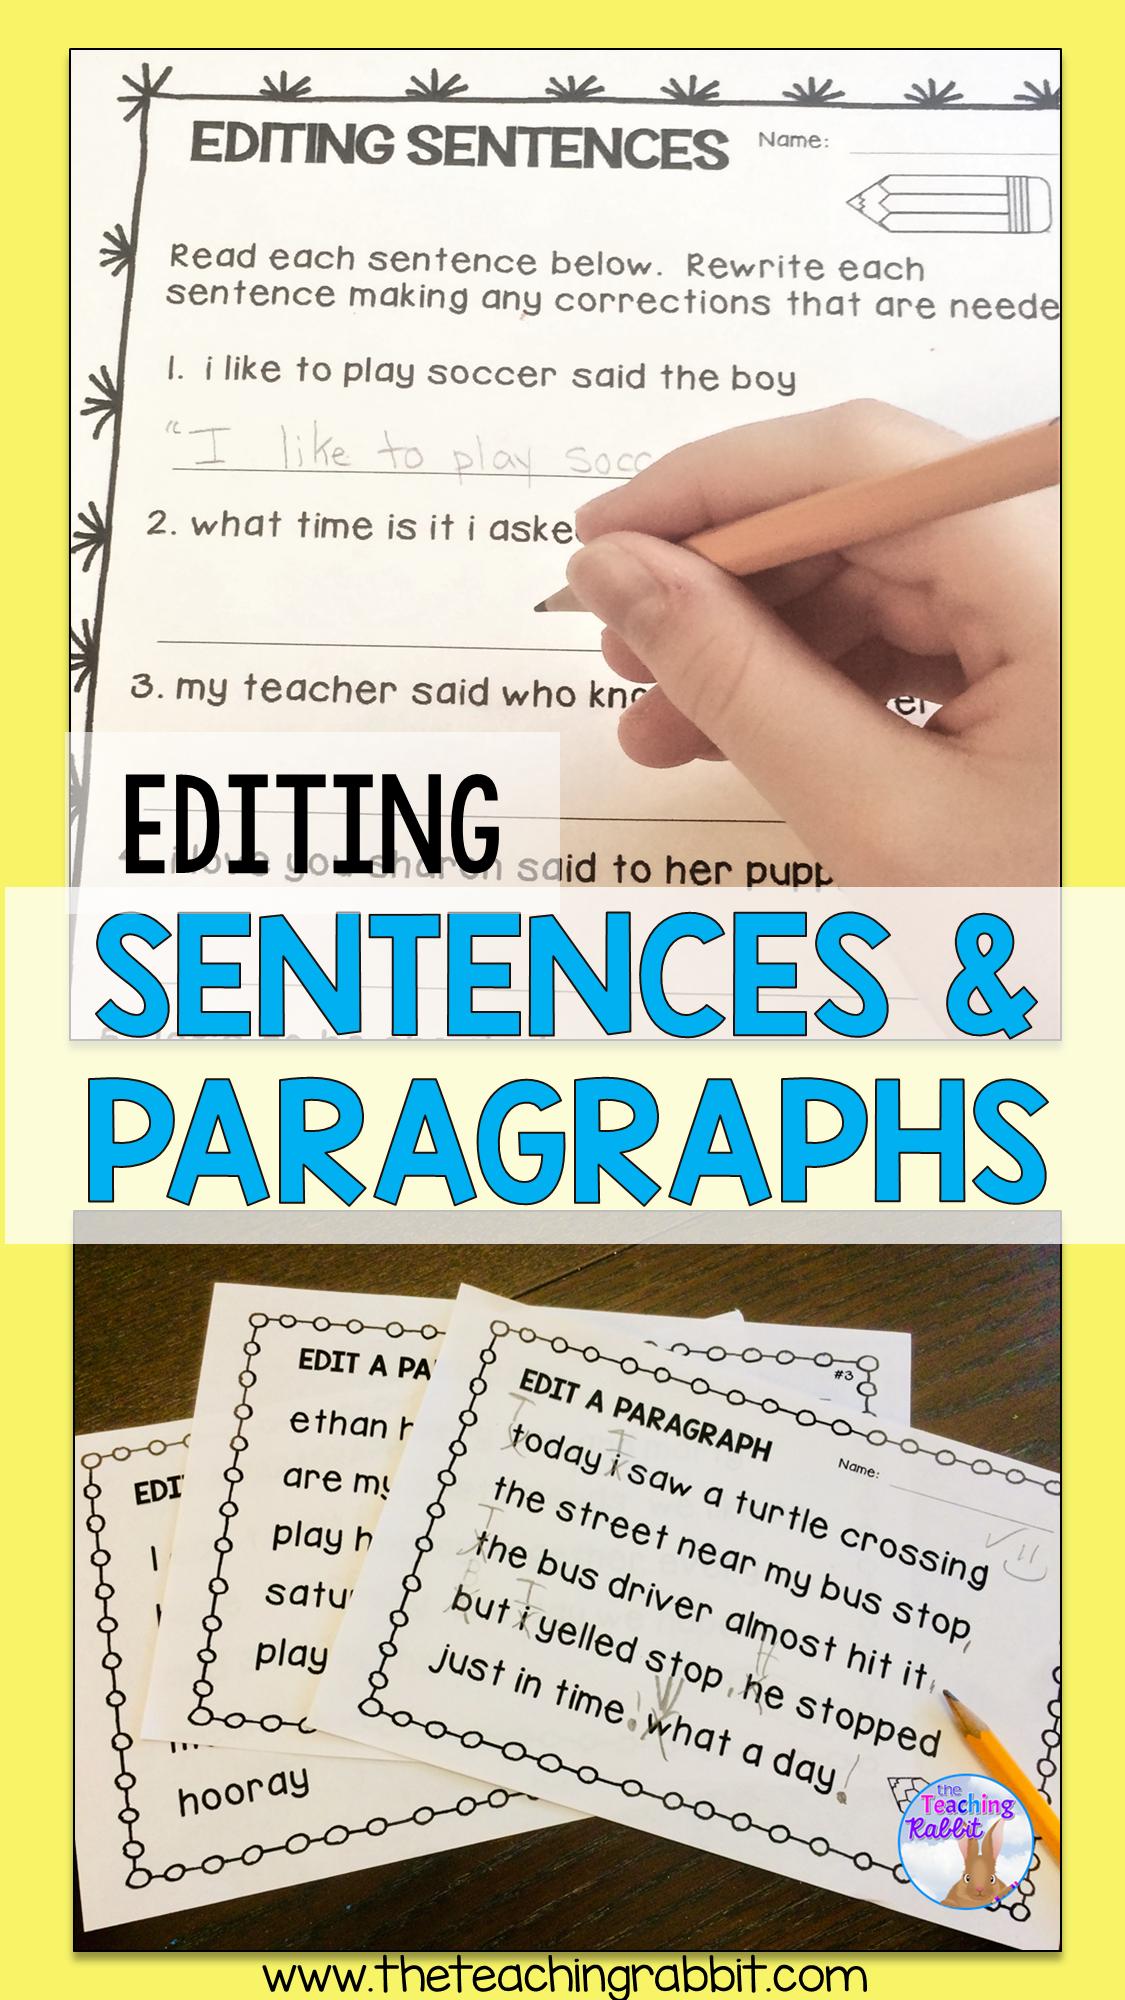 Editing Sentences Sentence Editing Capital Letters Worksheet Teaching Reading Comprehension [ 2000 x 1125 Pixel ]